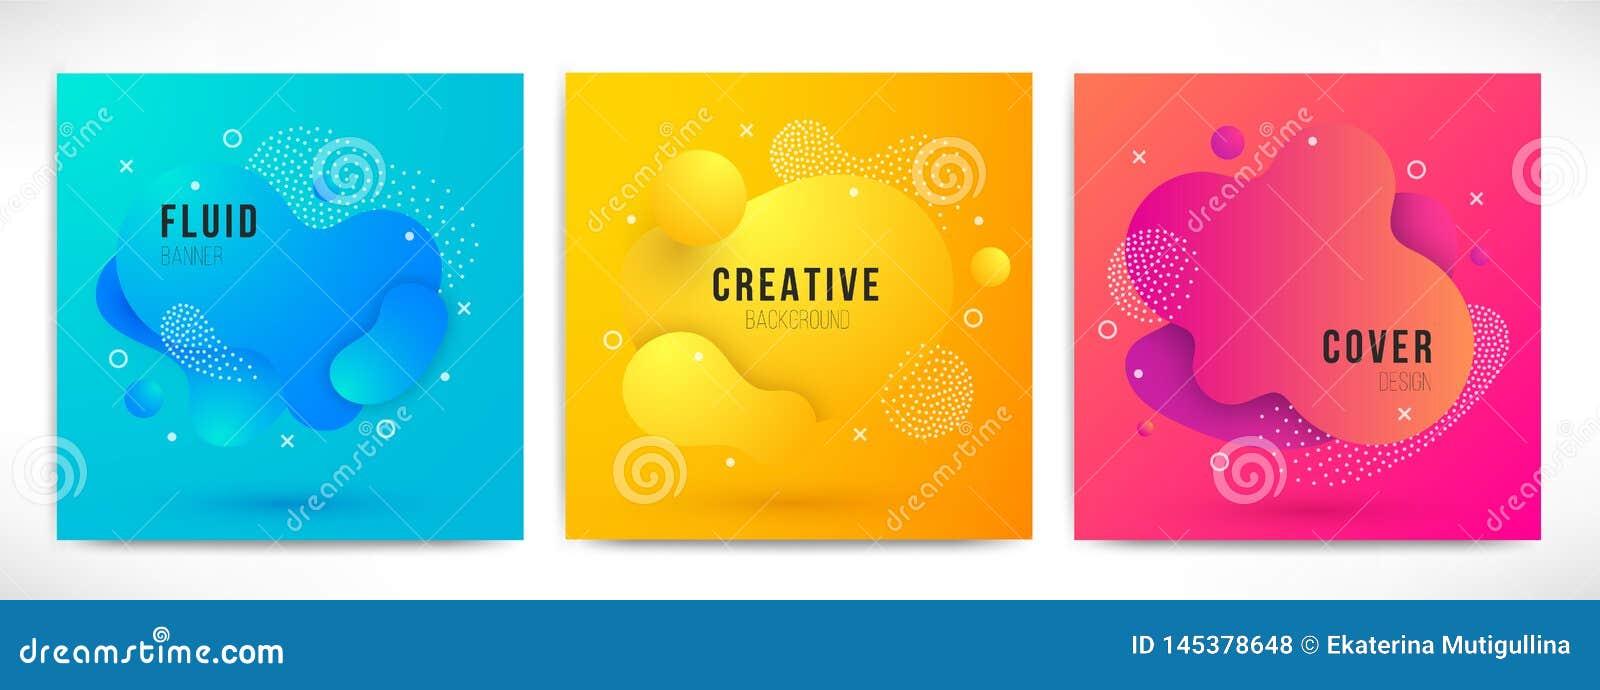 7edc1bce079bc Abstract modern liquid color Backgrounds set. Dynamic colorful design  elements. Fluid gradient geometric shapes for presentation, cover, logo,  flyer, web.